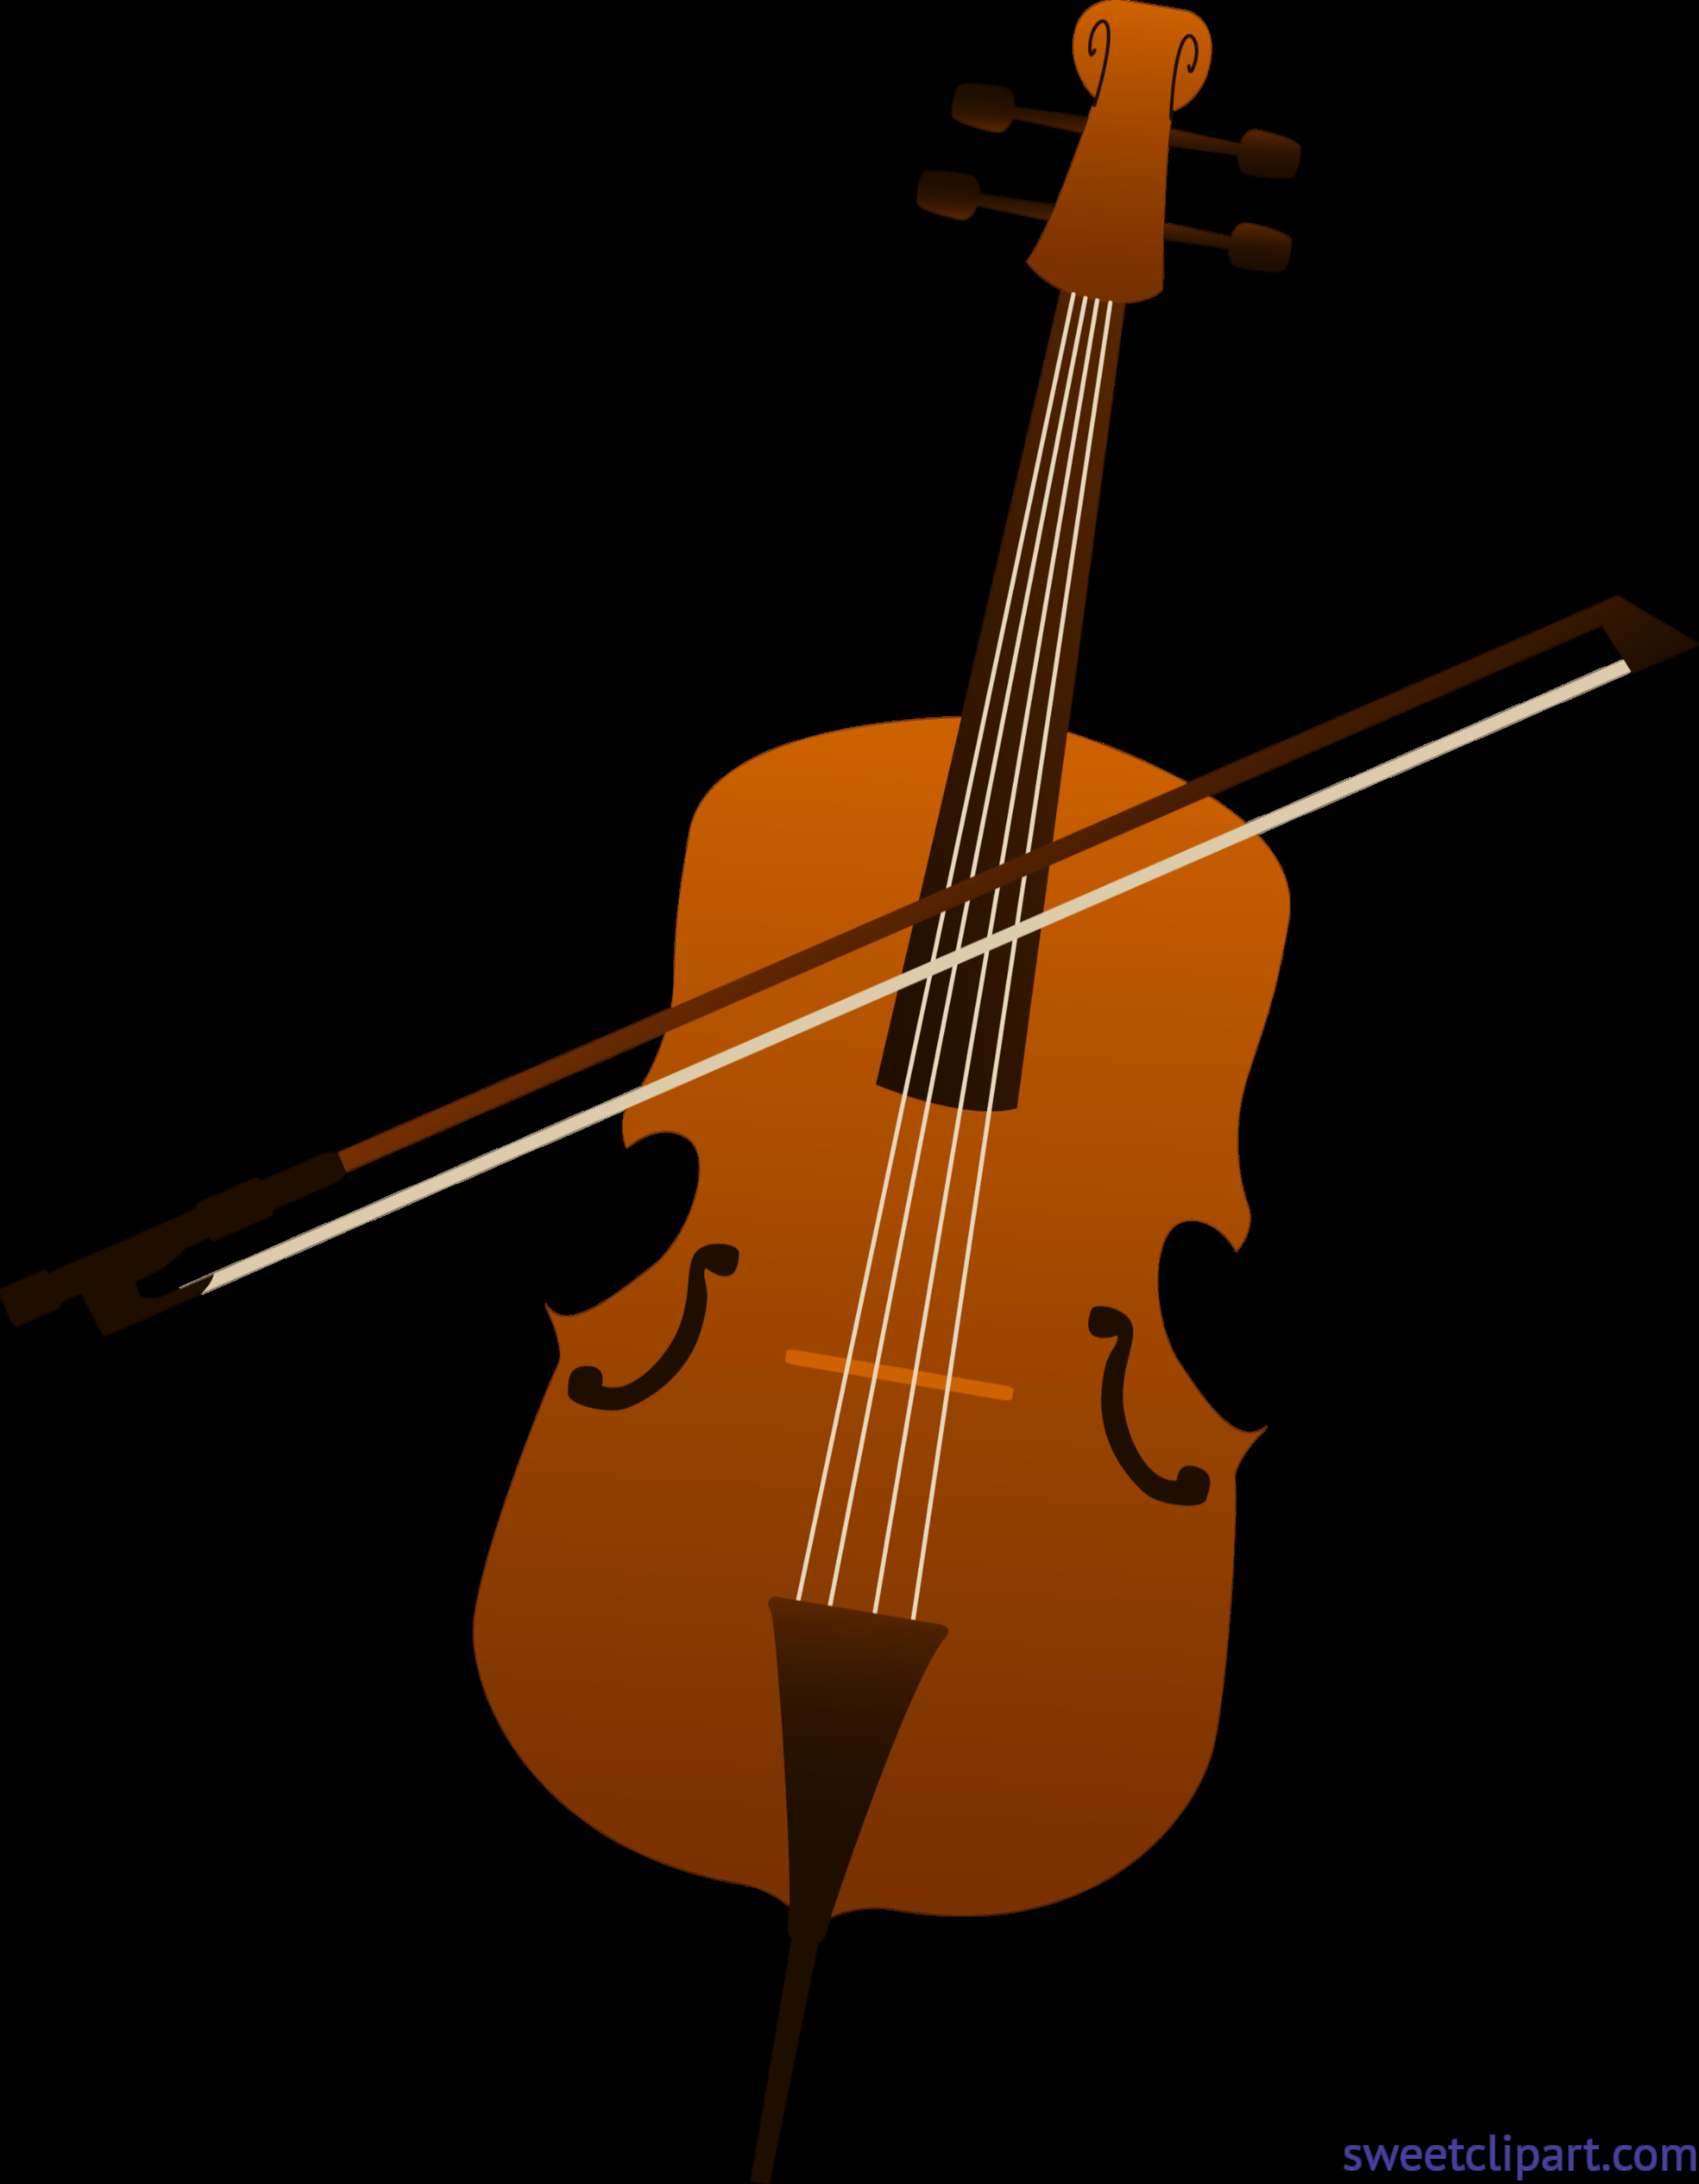 Cello clipart viola. Clip art sweet